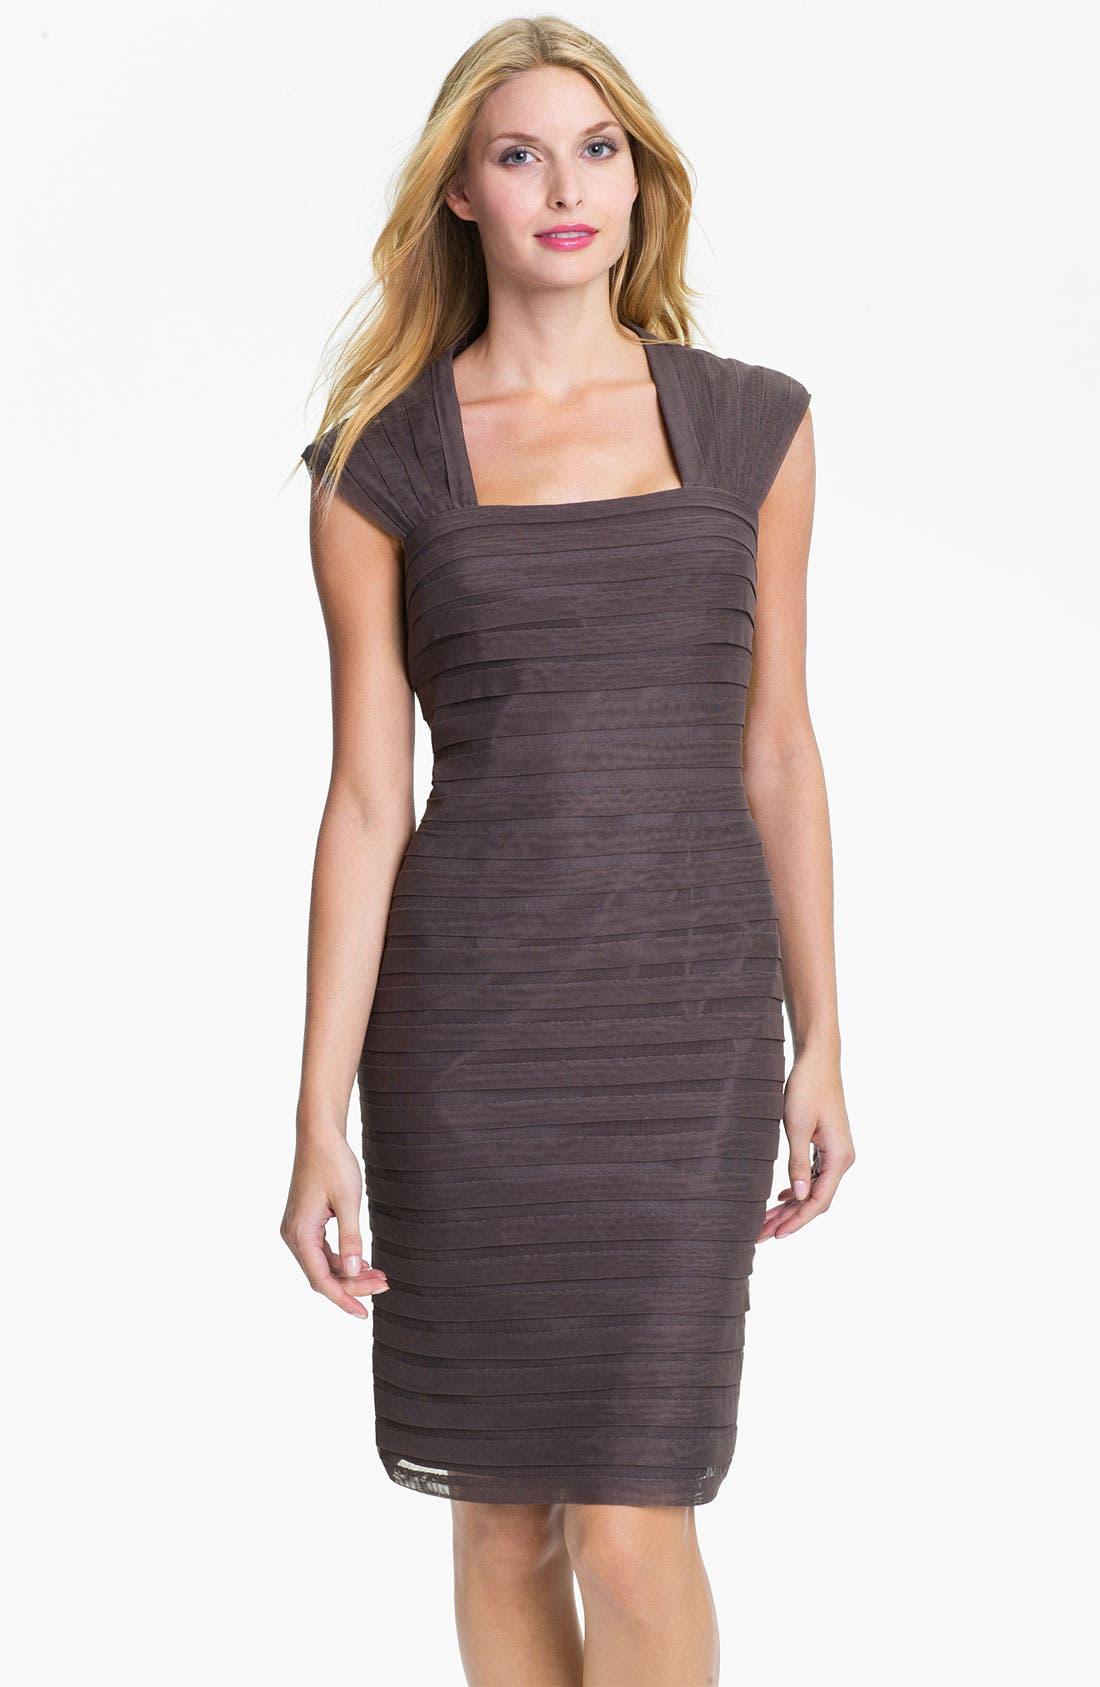 Alternate Image 1 Selected - Adrianna Papell Shutter Pleat Mesh & Taffeta Sheath Dress